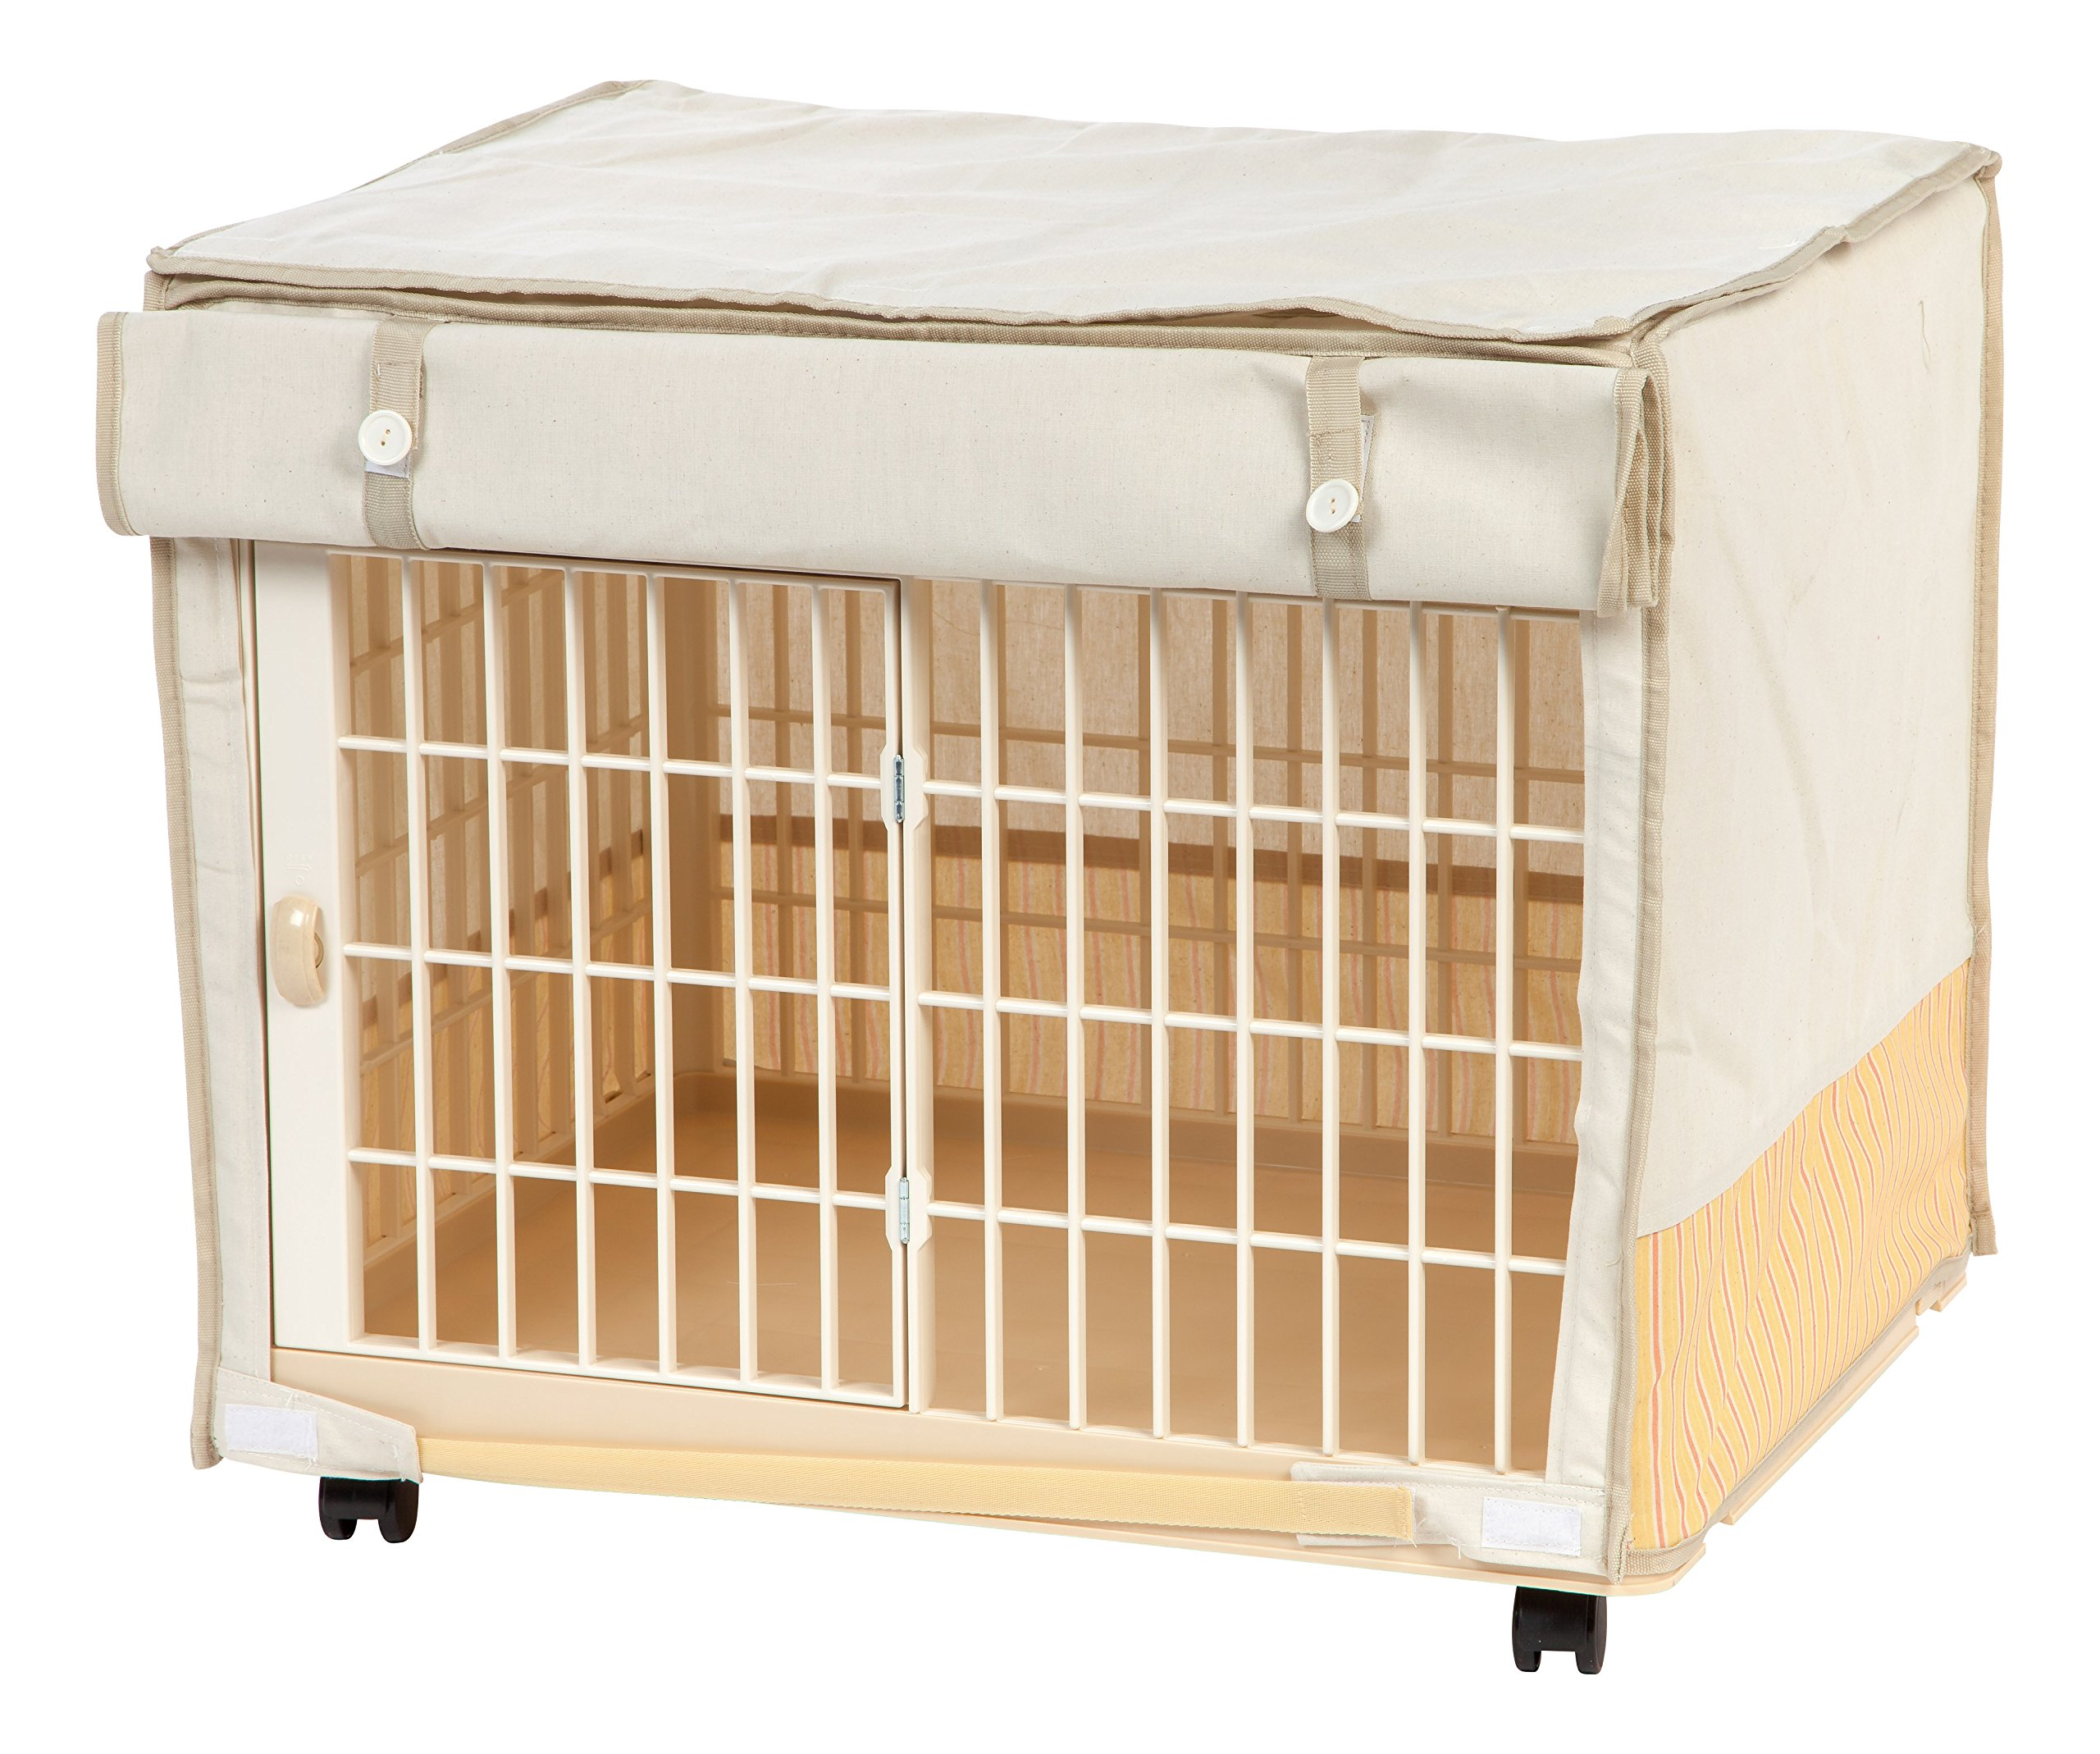 IRIS Covered Plastic Animal Cage, White, Extra Small by IRIS USA, Inc.